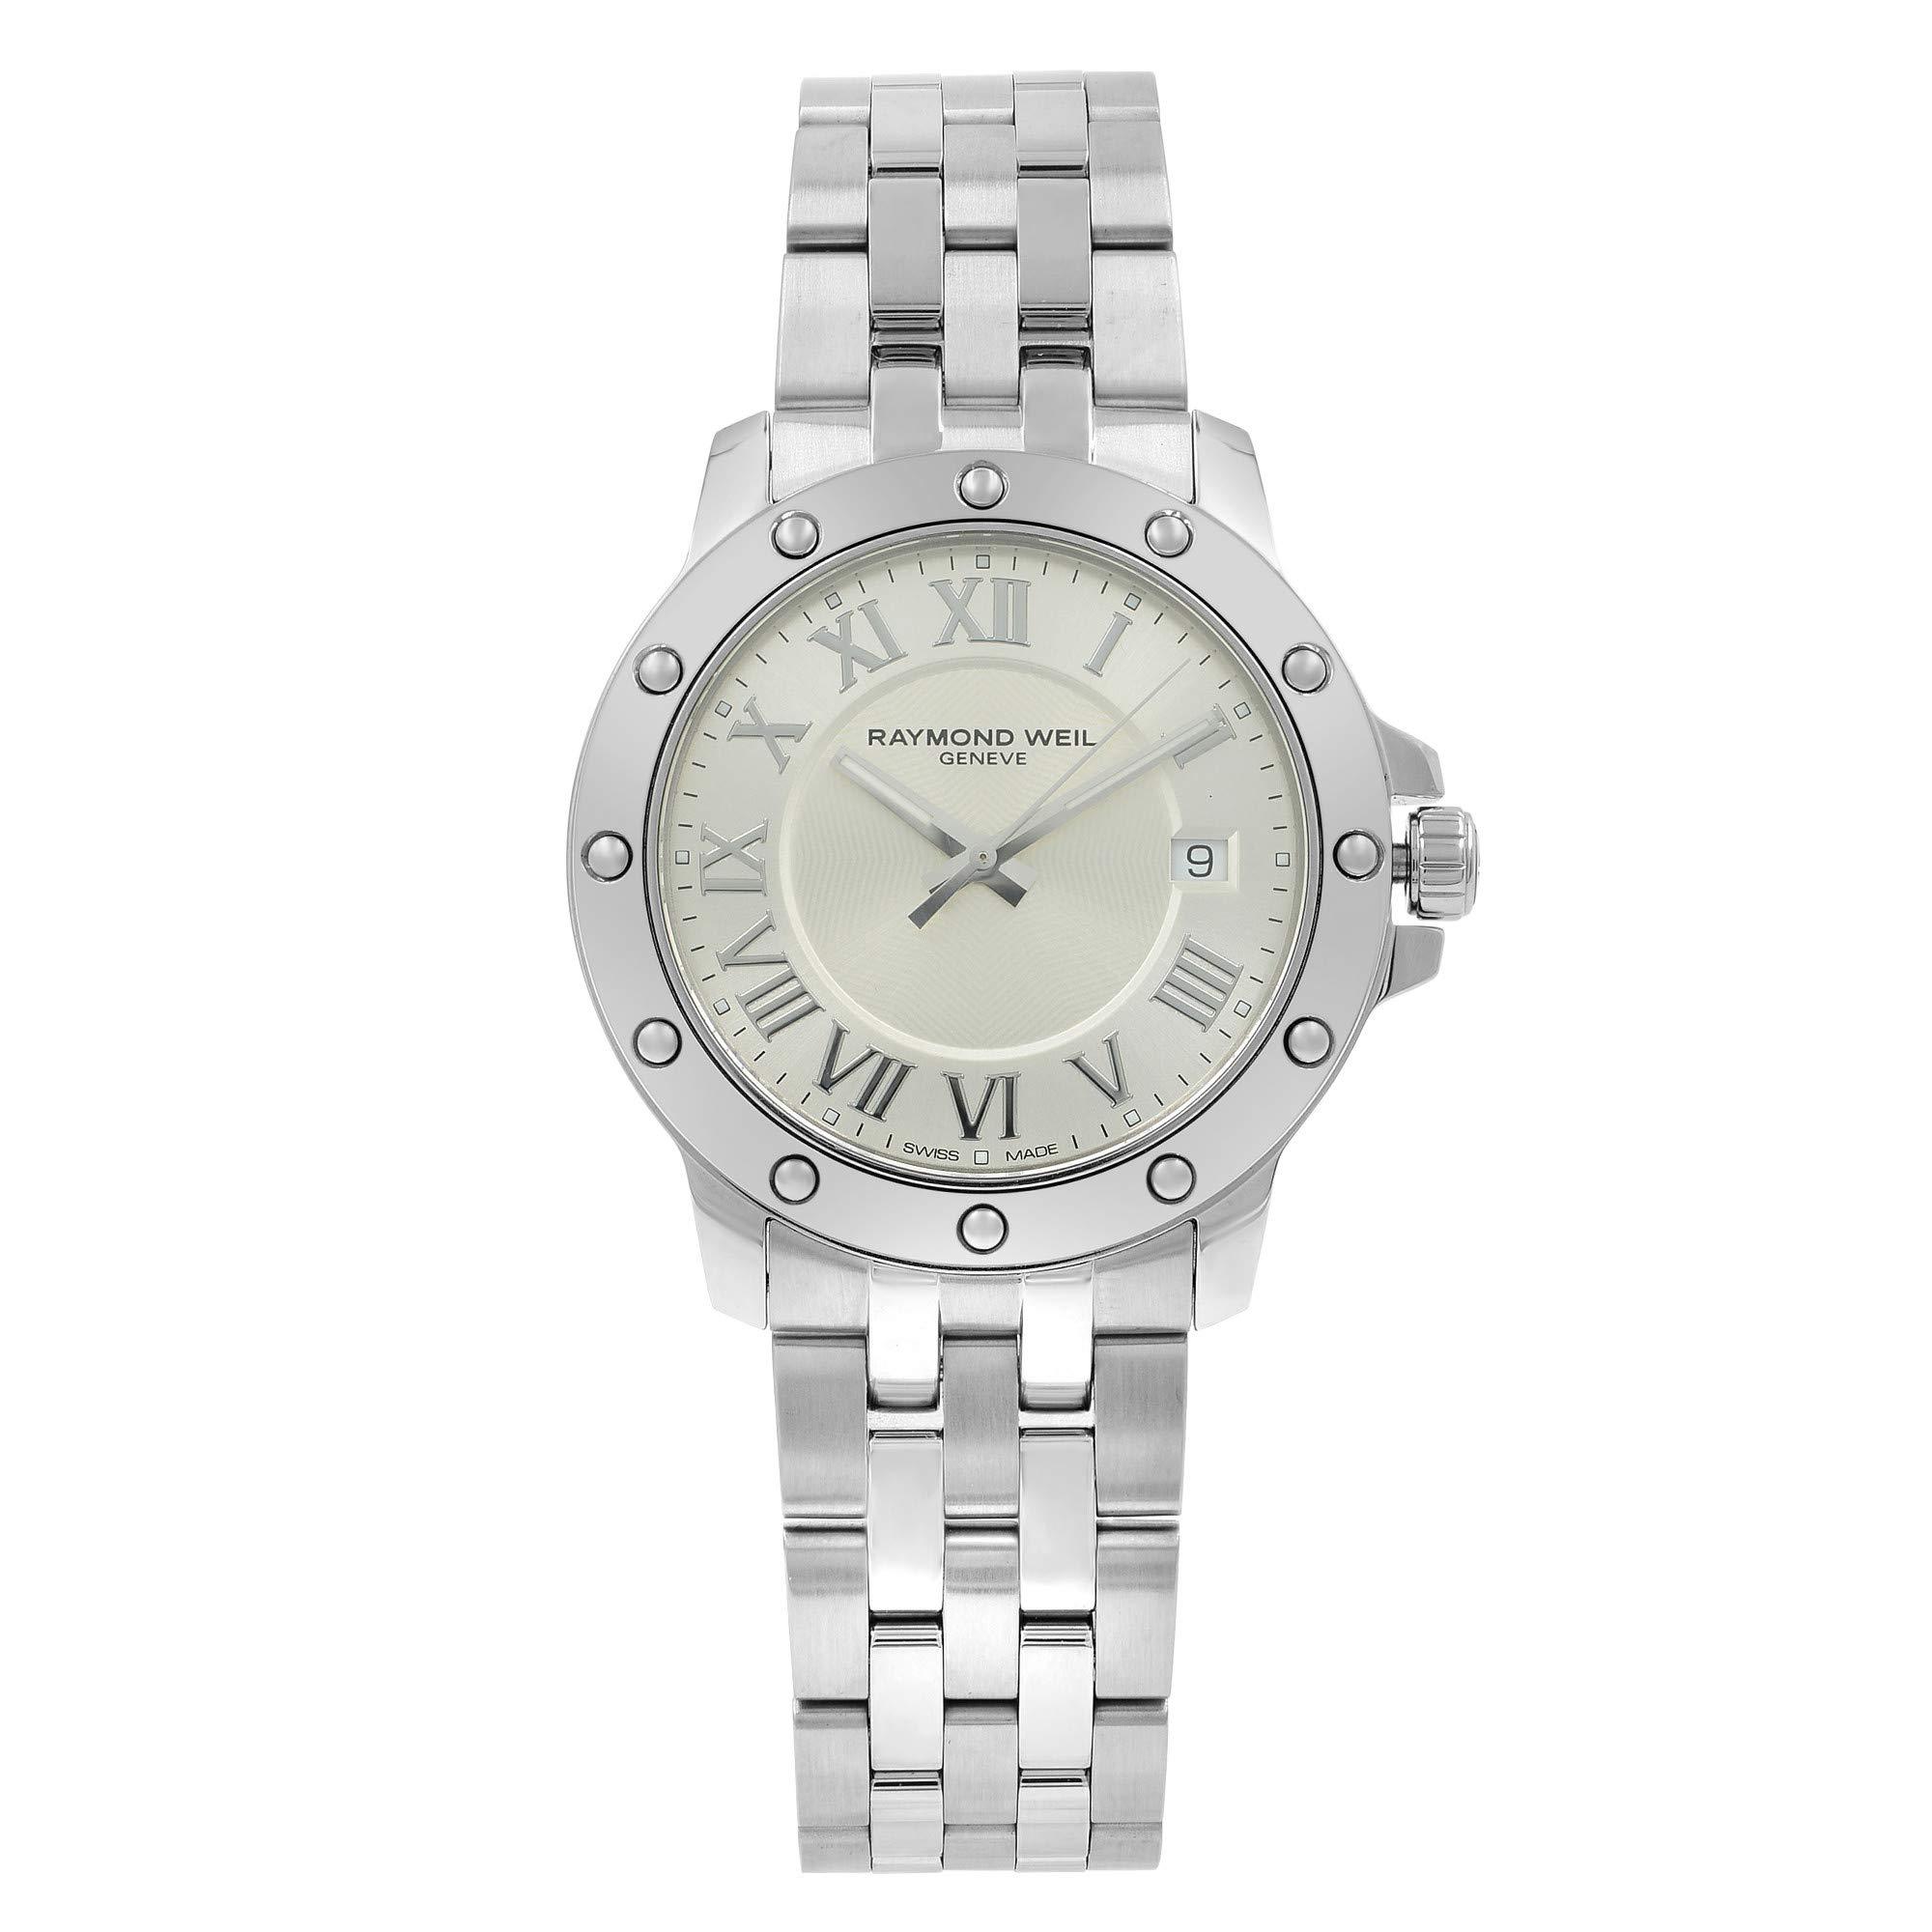 Raymond Weil Tango Quartz Male Watch 5599-ST-00658 (Certified Pre-Owned) by RAYMOND WEIL